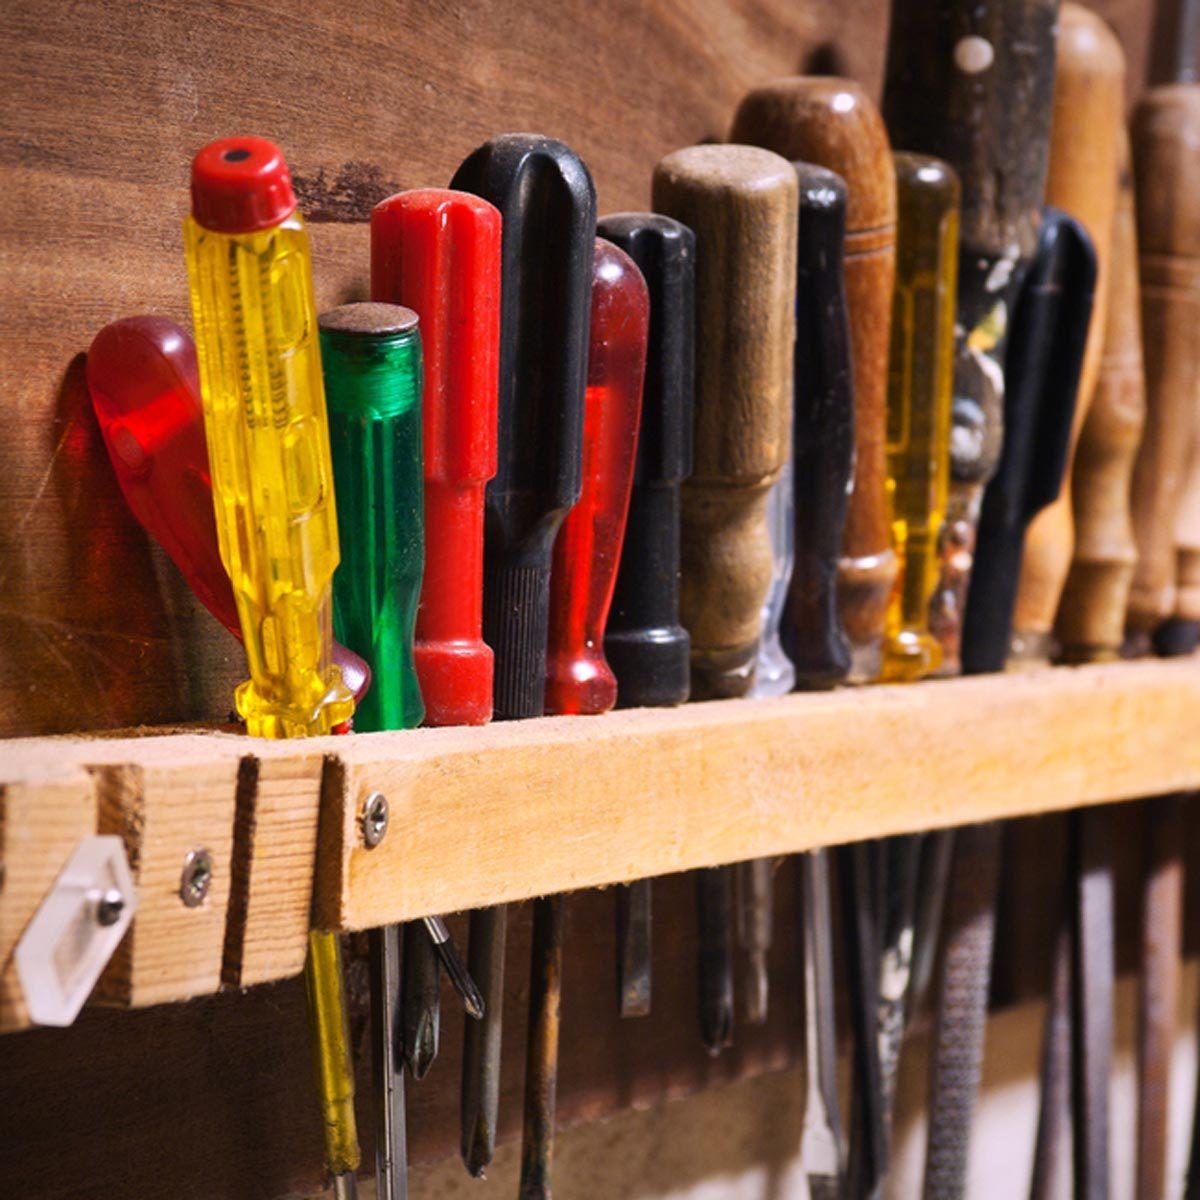 shutterstock_63069544 organized hand tools